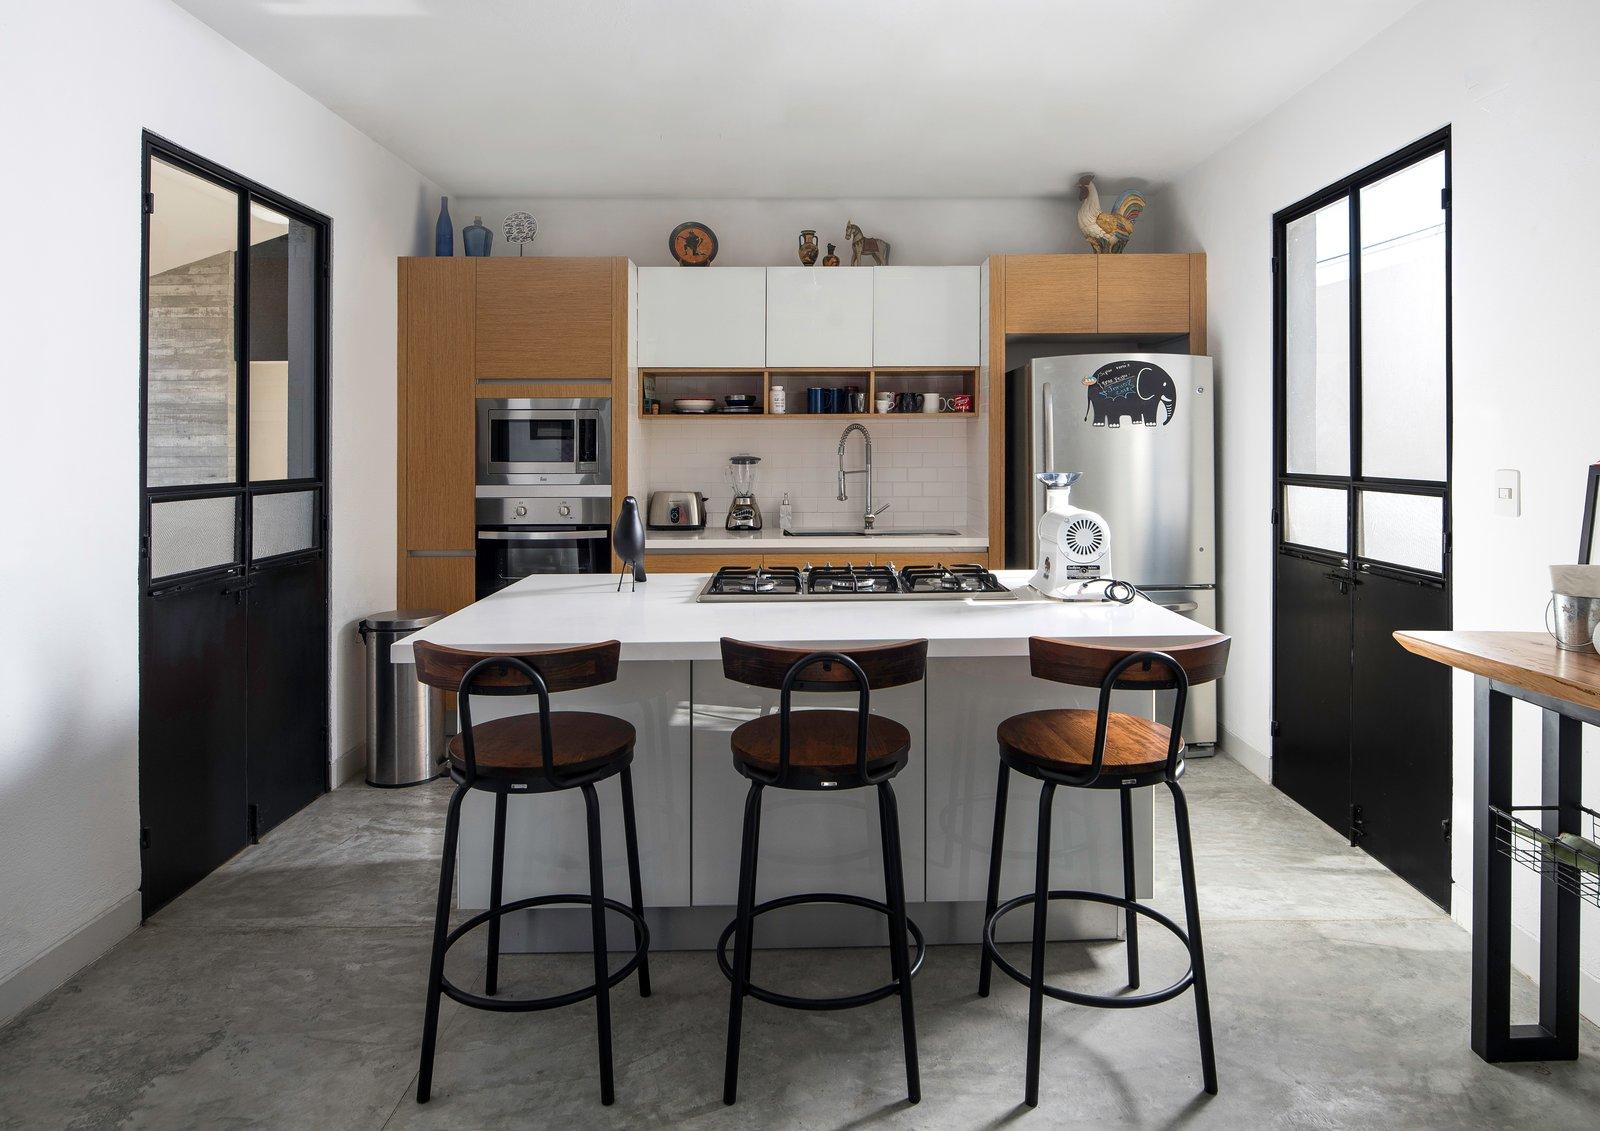 Kitchen, Mosaic Tile Backsplashe, Refrigerator, Concrete Floor, Wall Oven, Beverage Center, Wood Cabinet, Drop In Sink, Ceiling Lighting, Microwave, and Brick Backsplashe Kitchen  Pia Residence